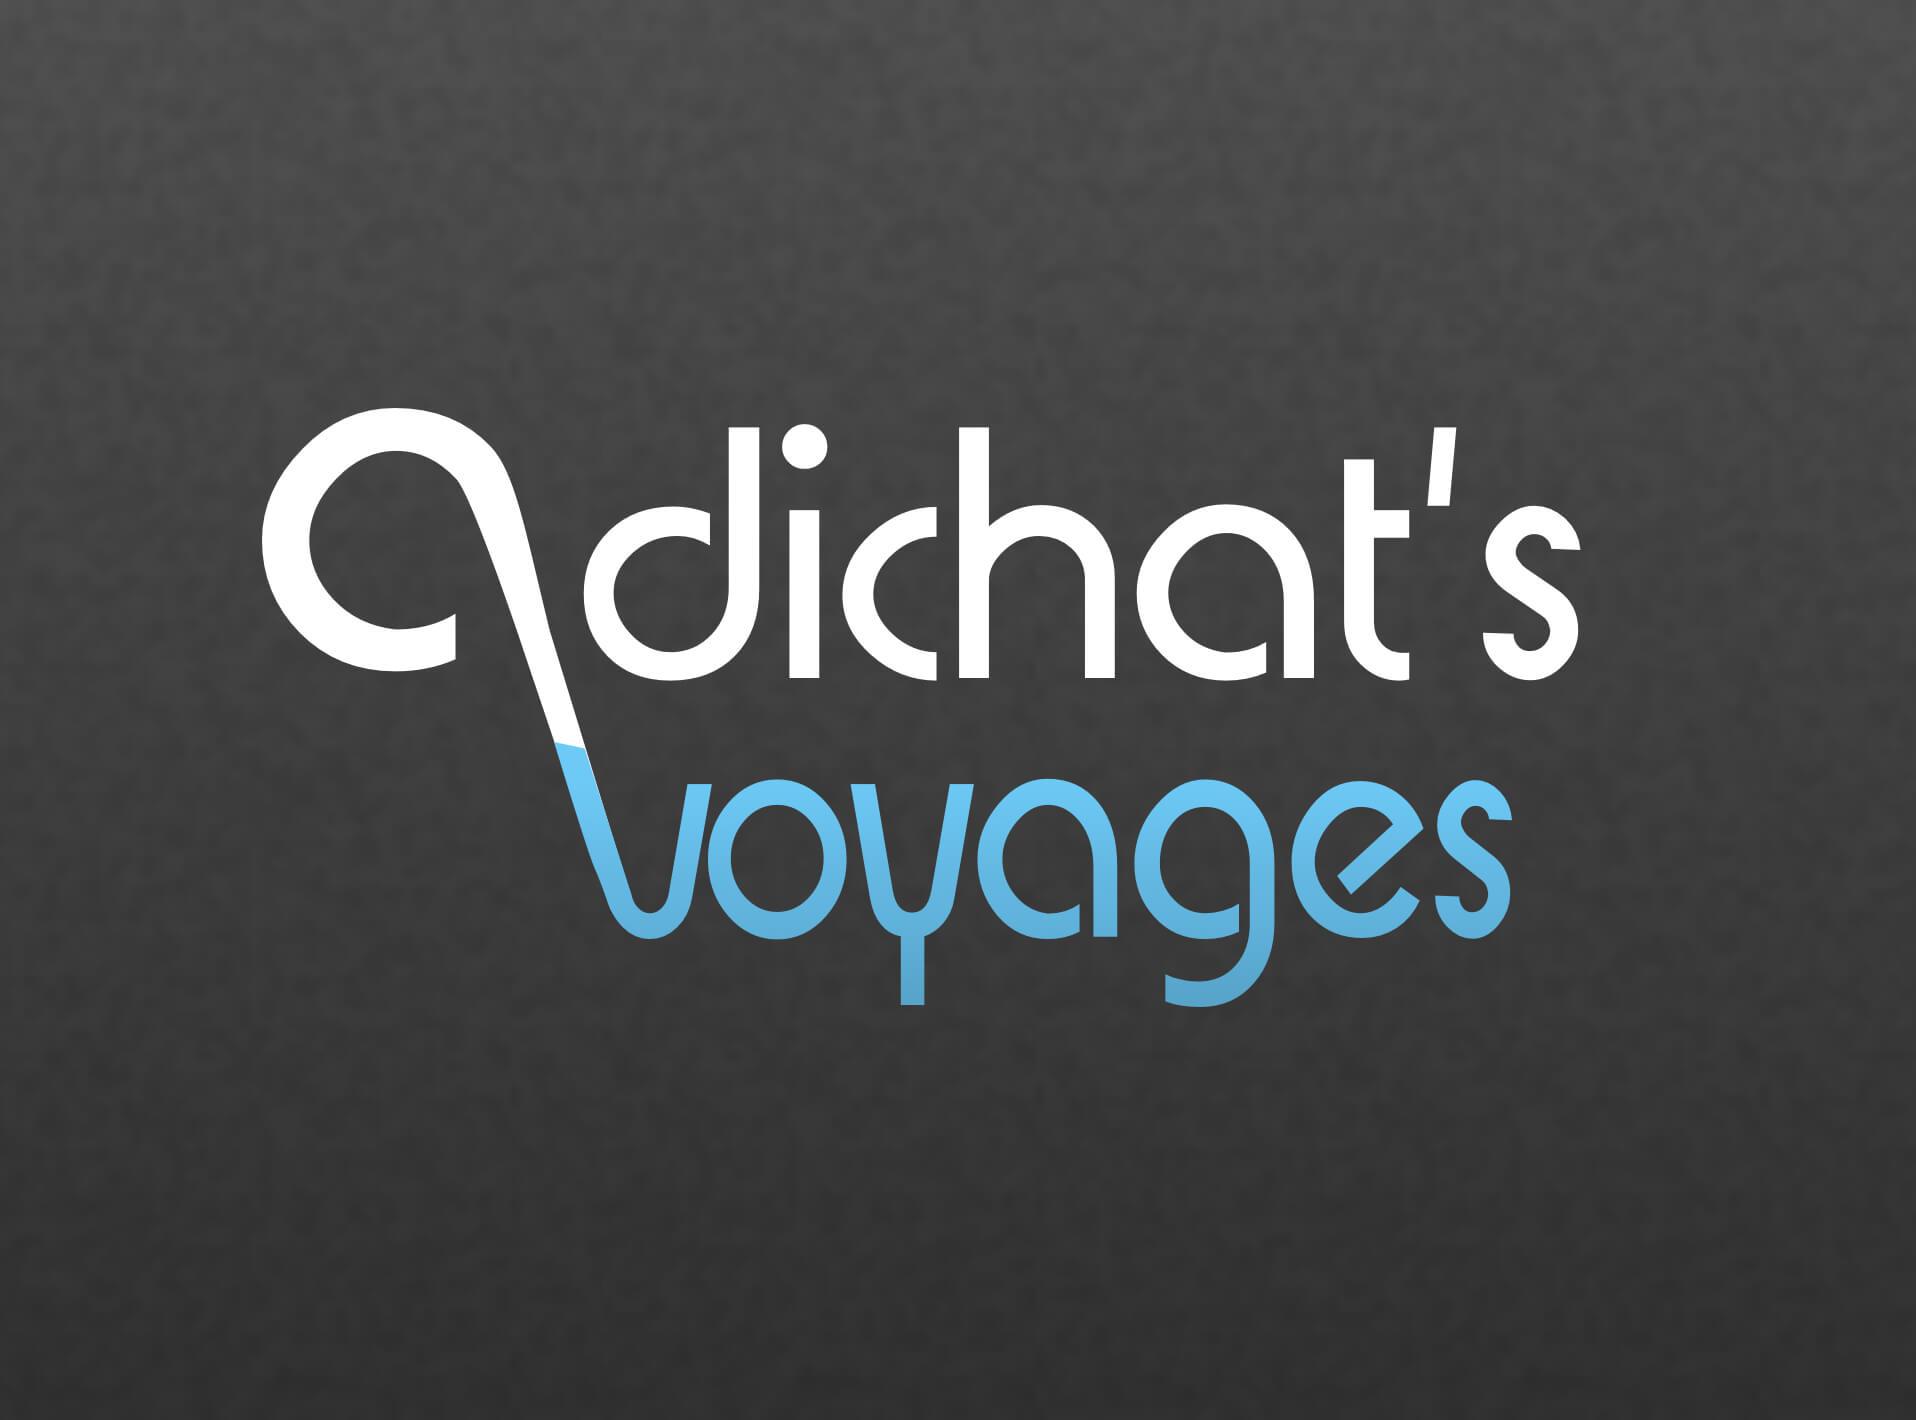 ADICHAT'S VOYAGES